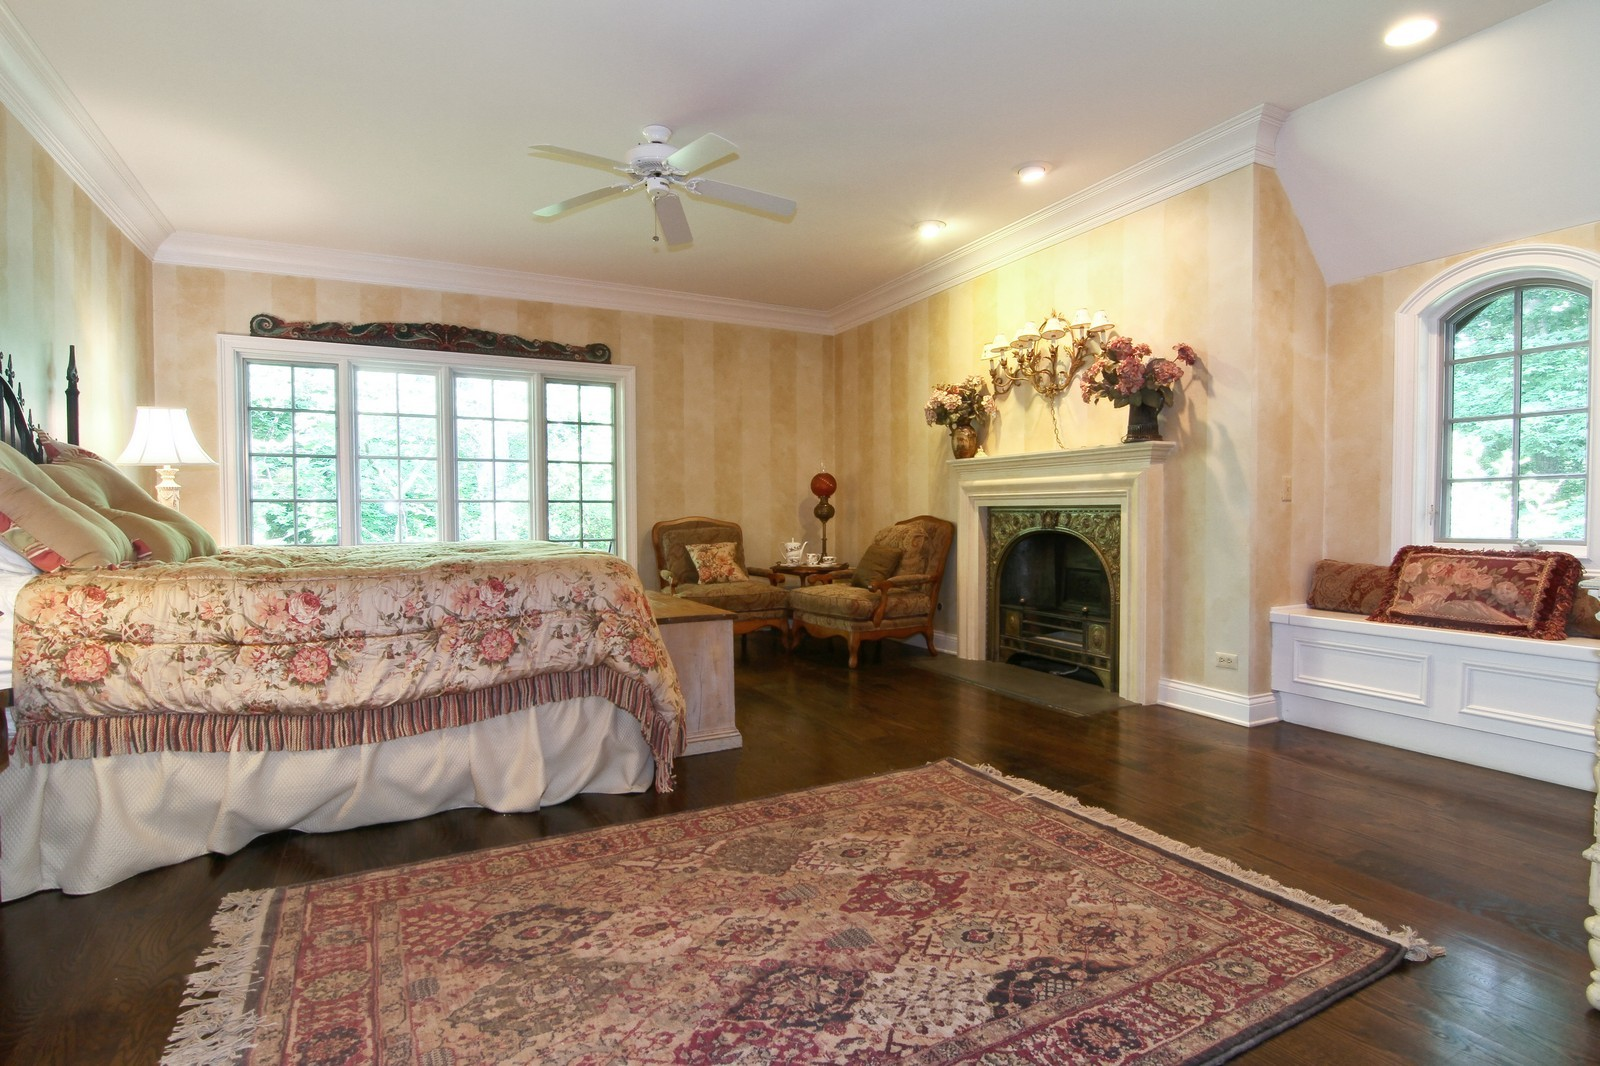 Real Estate Photography - 2901 Glenbriar Dr, St Charles, IL, 60174 - Master Bedroom